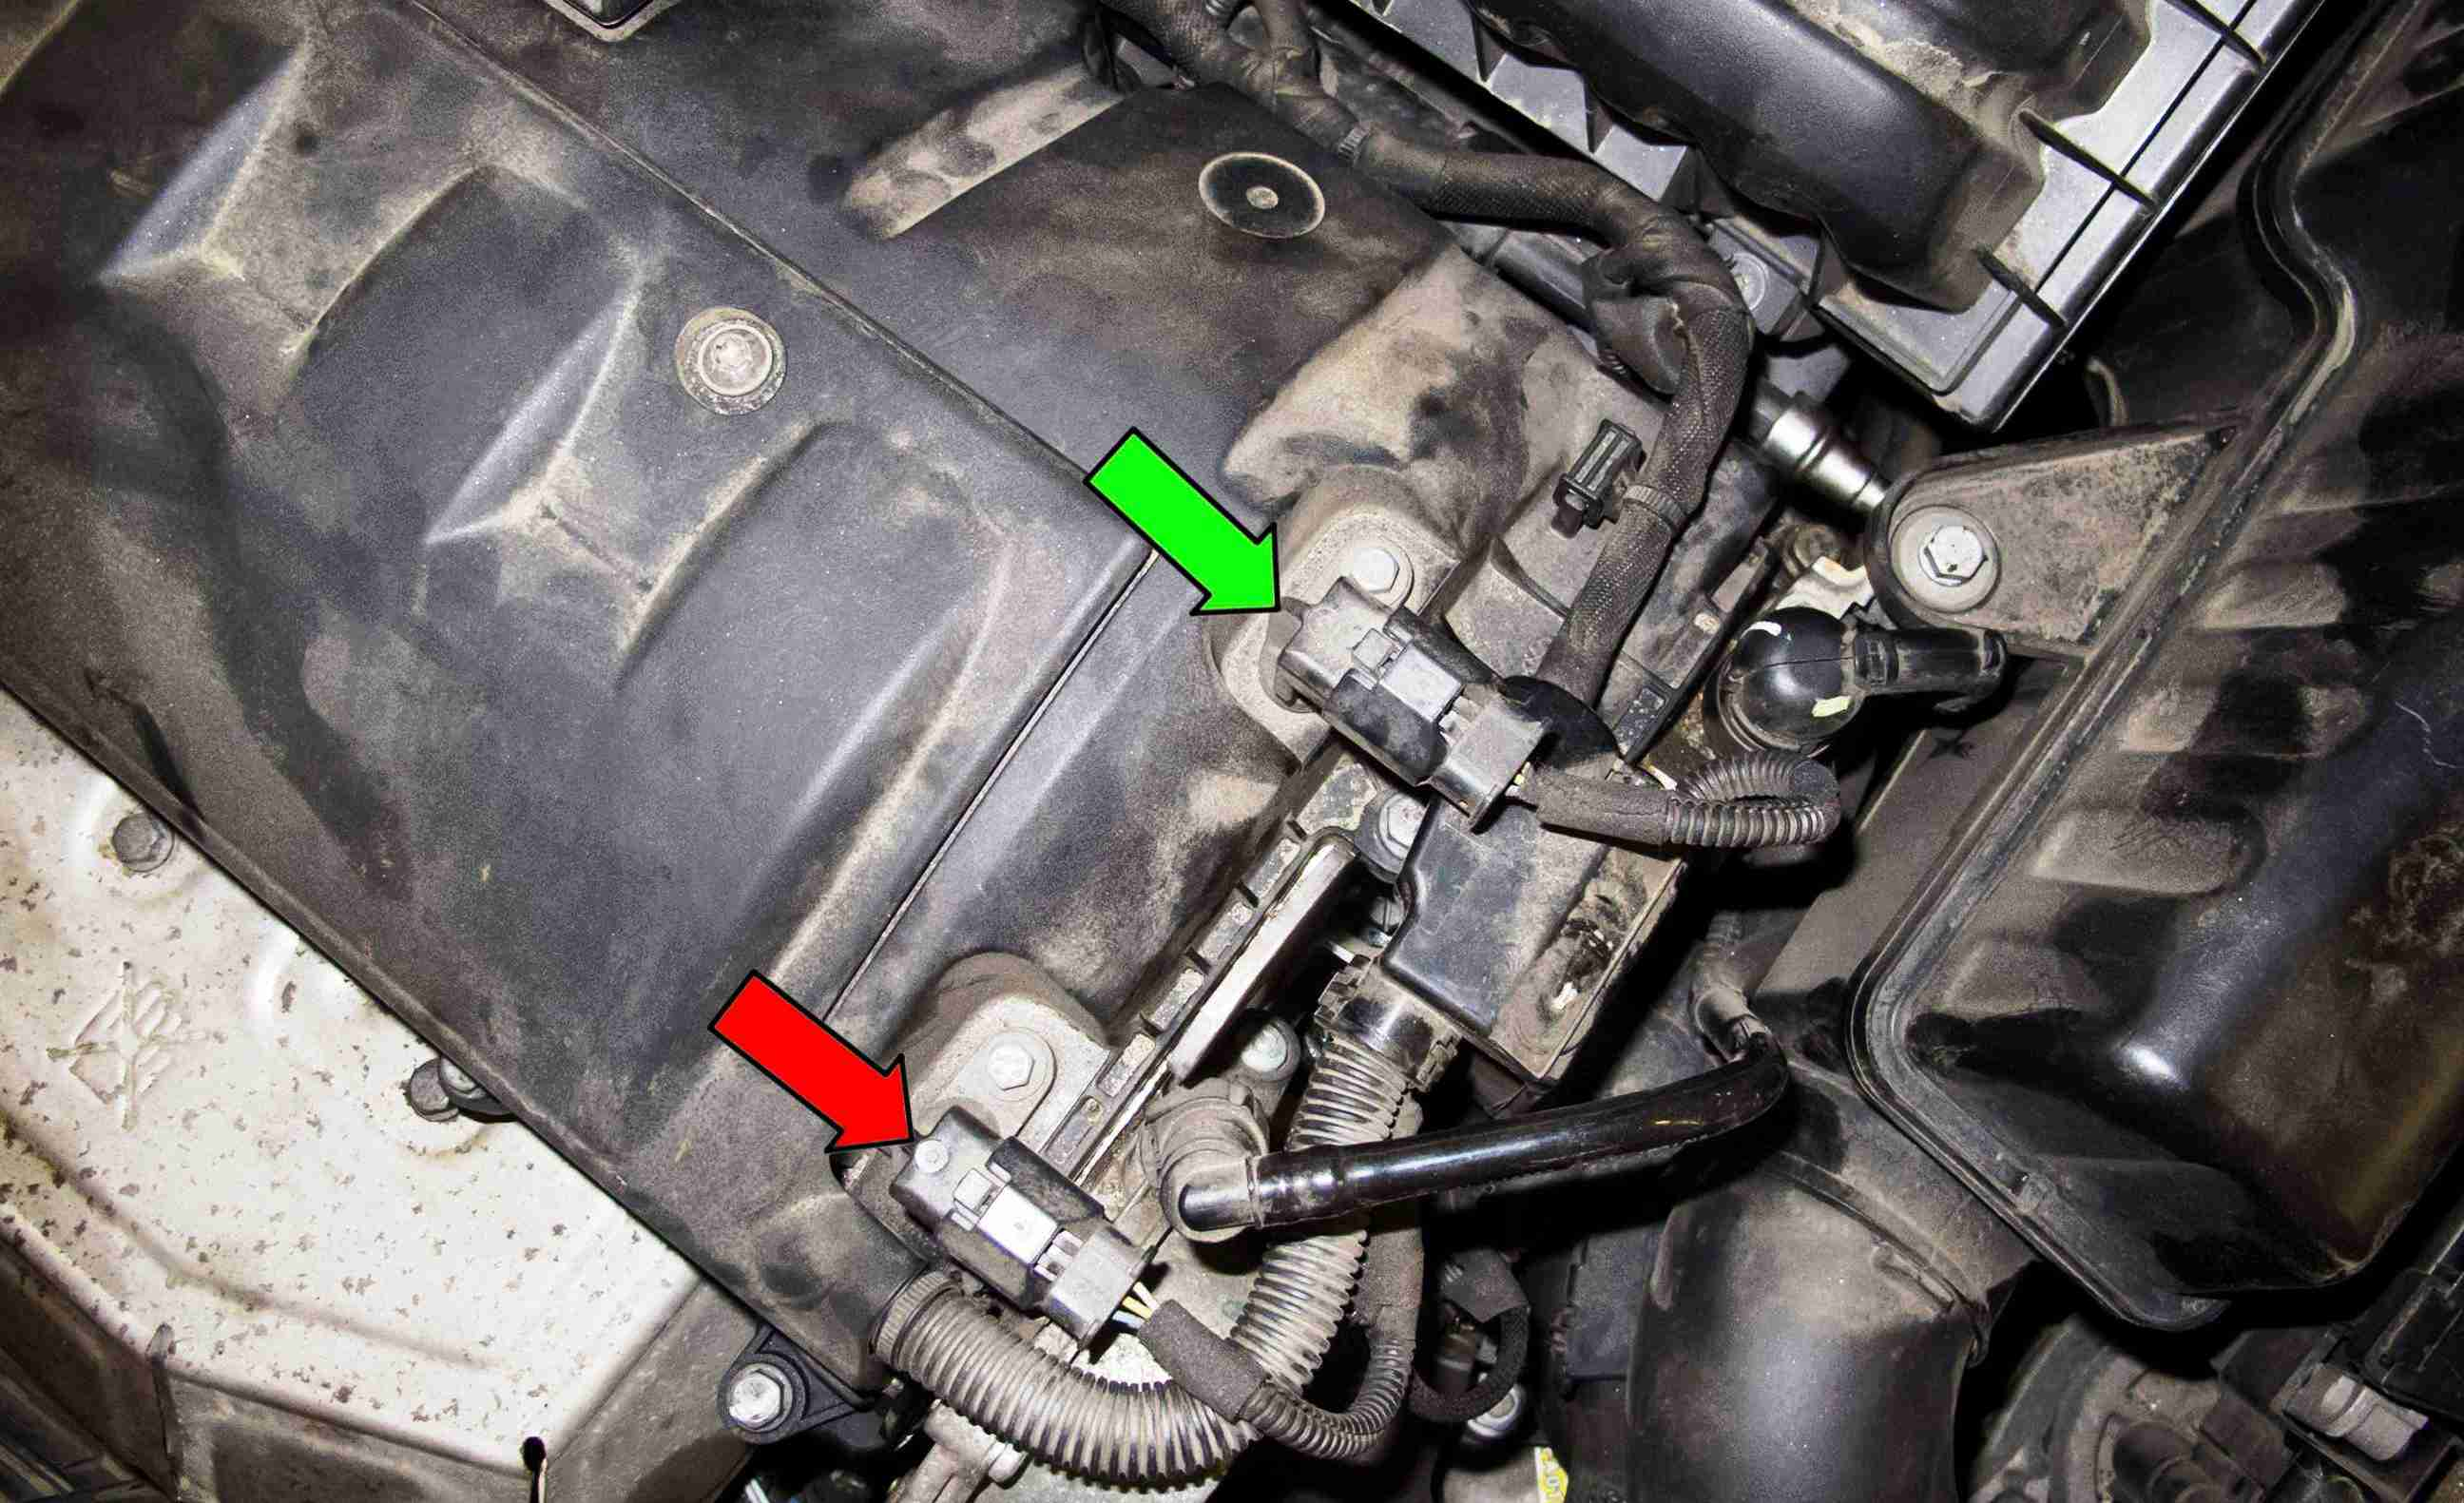 Mini Cooper Camshaft Position Sensor Location on Camshaft Position Actuator Bank 1